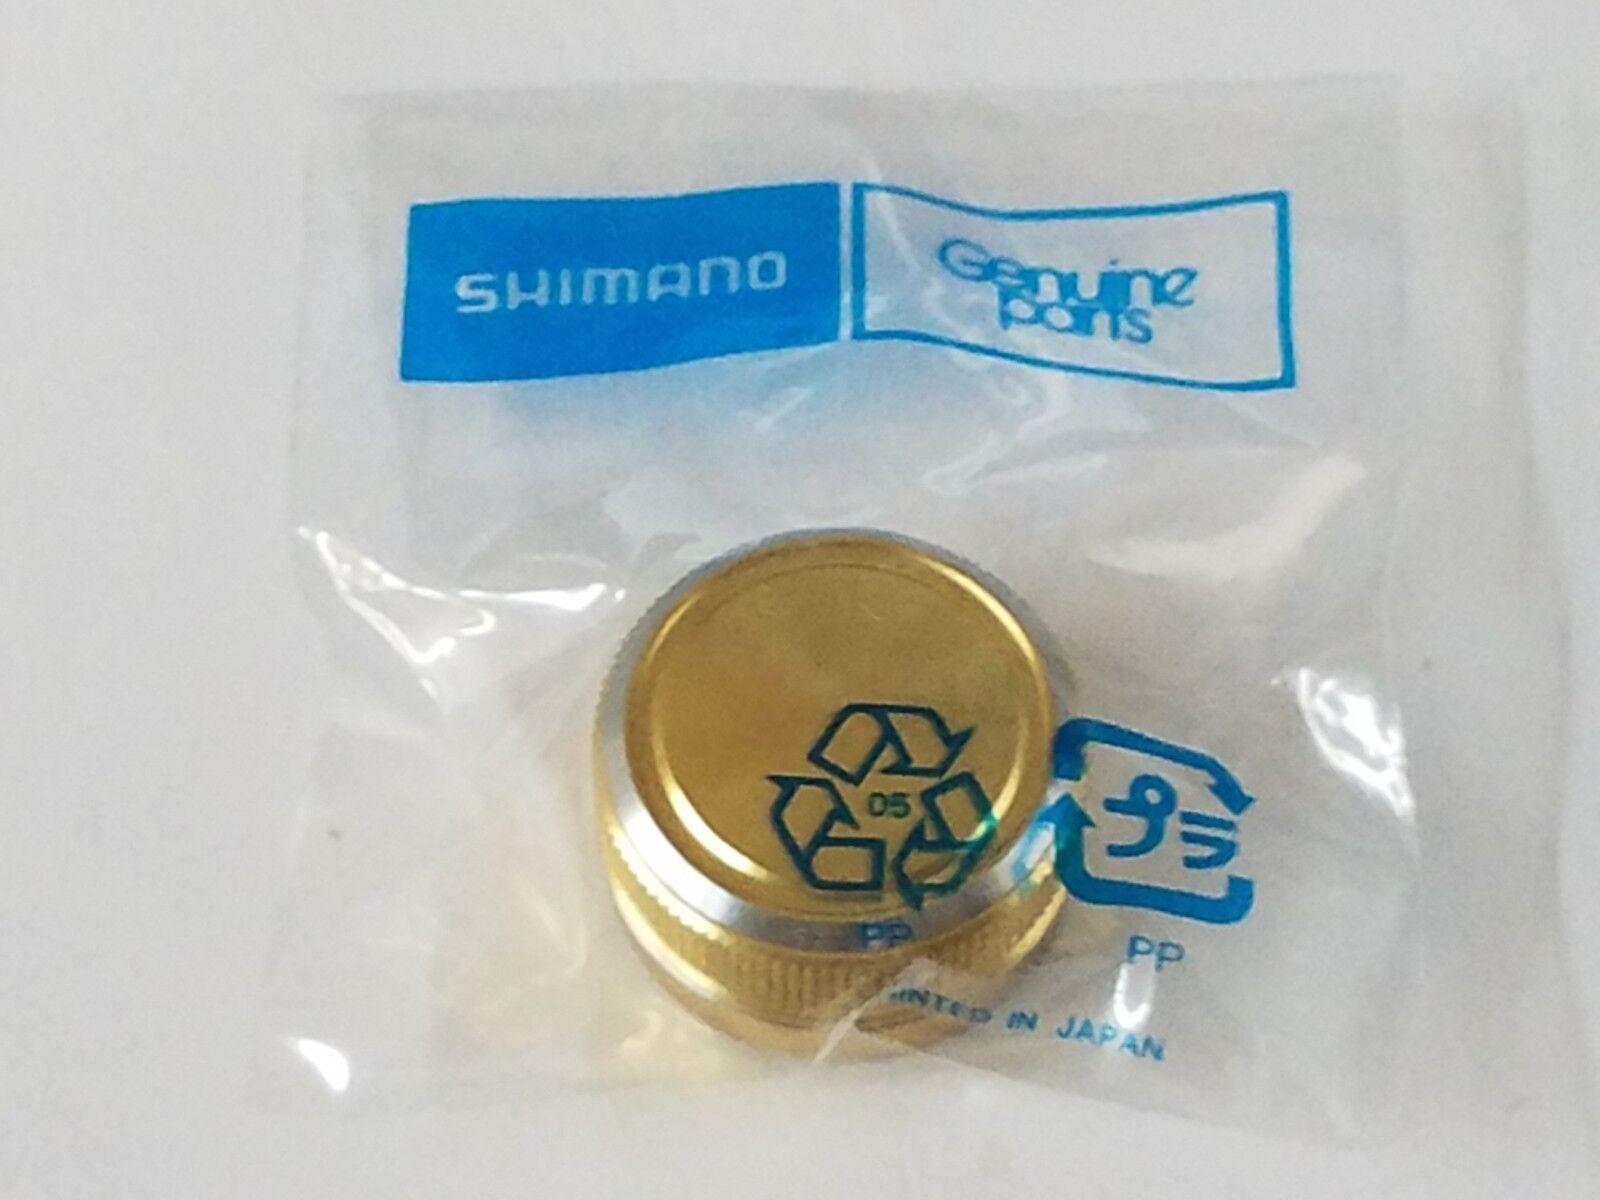 1 Shimano PartBNT 4941 Cast Control Cap Fits Conquest 100 and 200